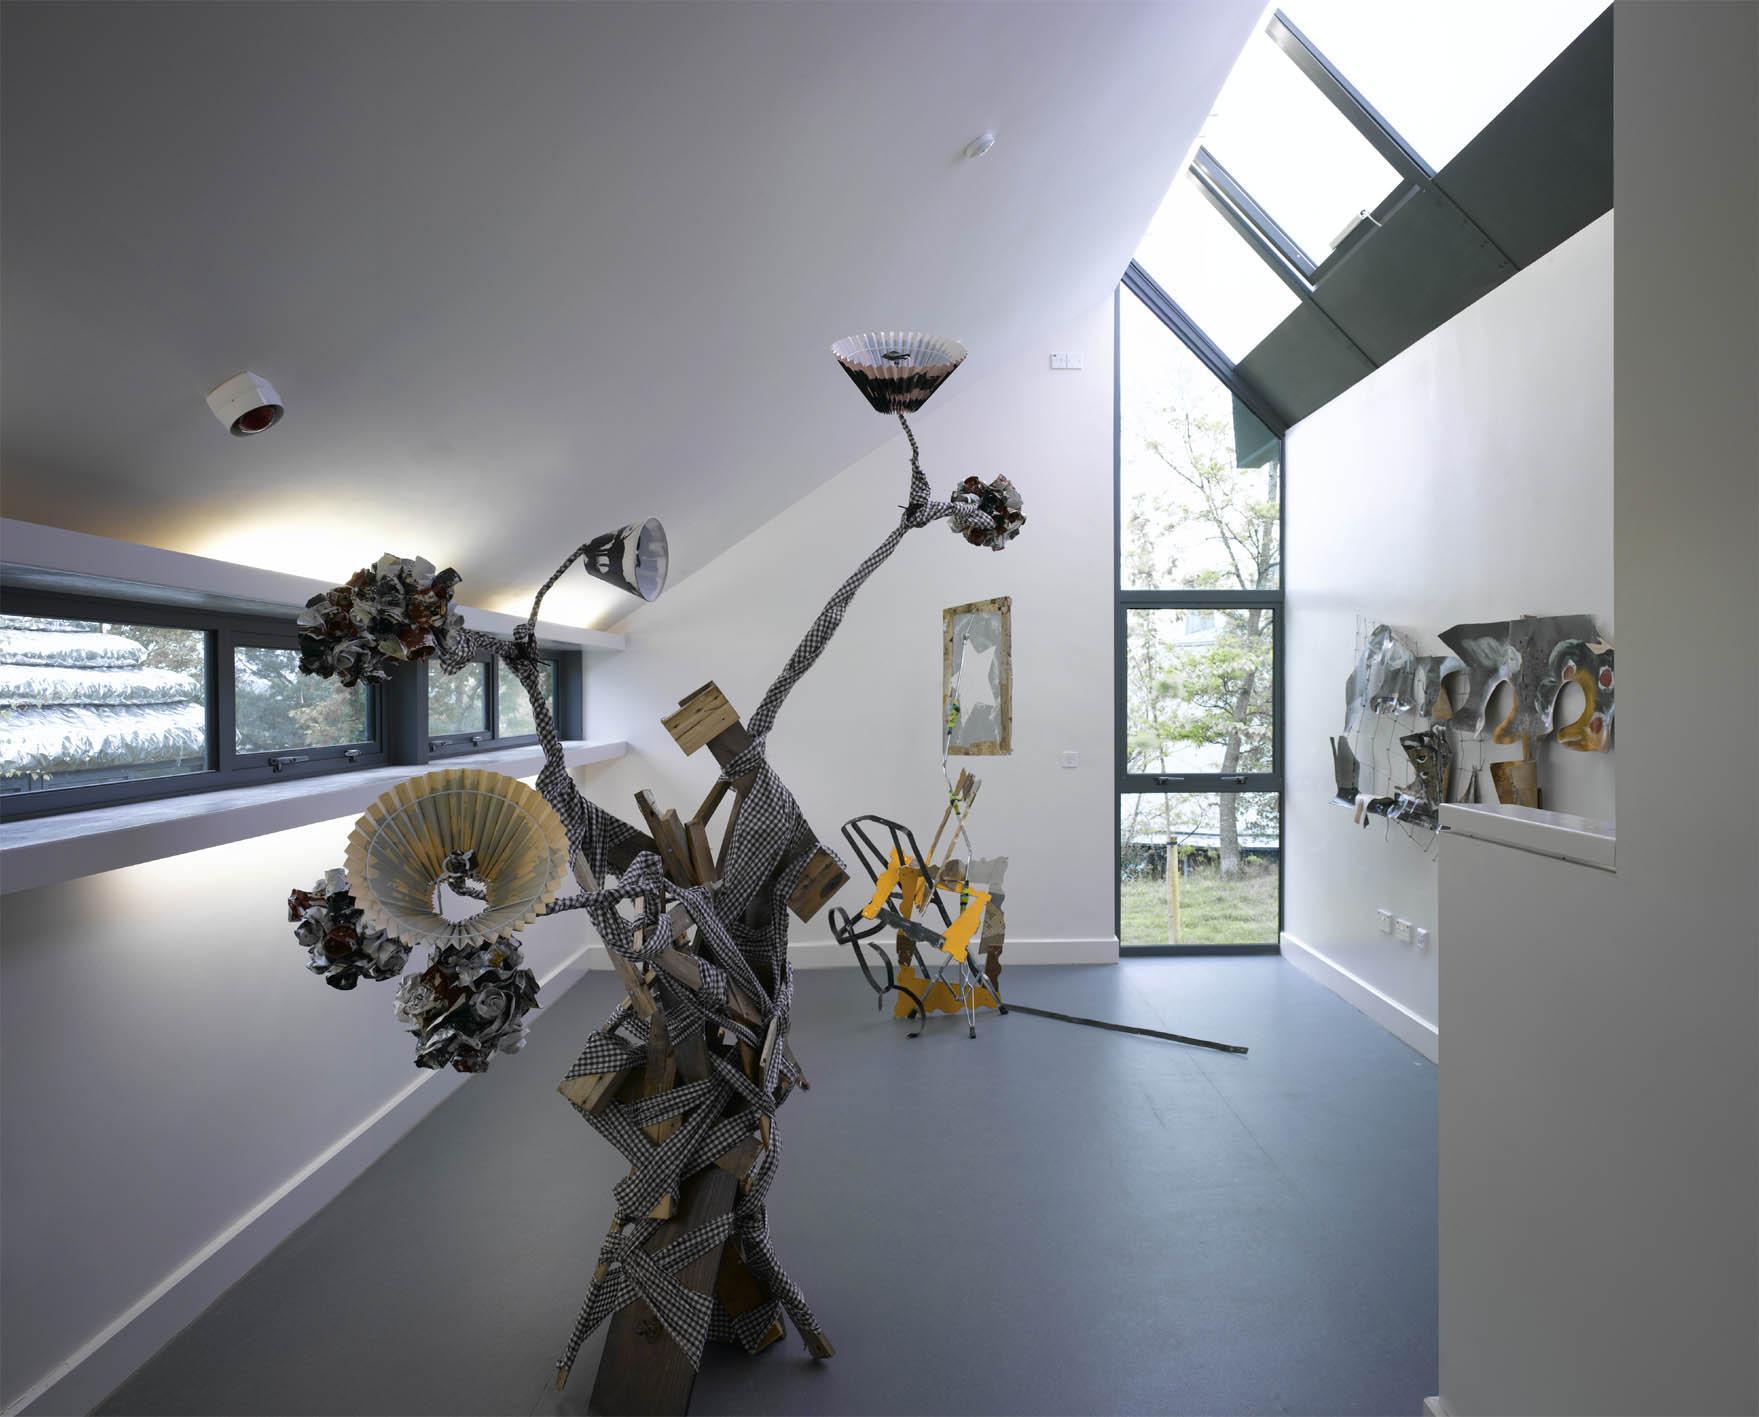 Aberystwyth Creative Units - Interior 2 (c) Edmund Sumner